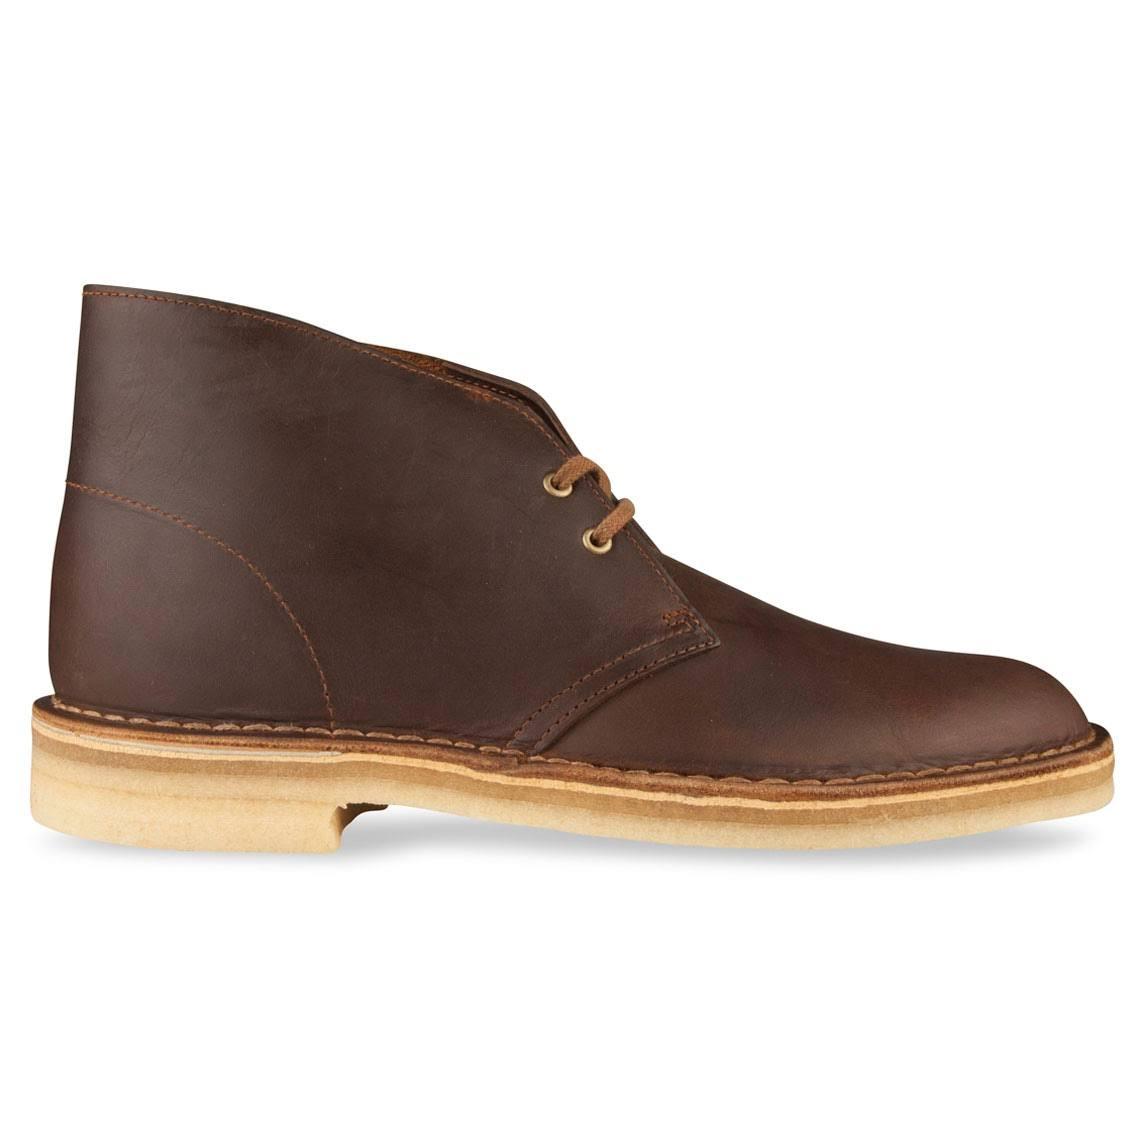 Originals Brown Desert Beeswax Clarks Boot PiTZOXuk